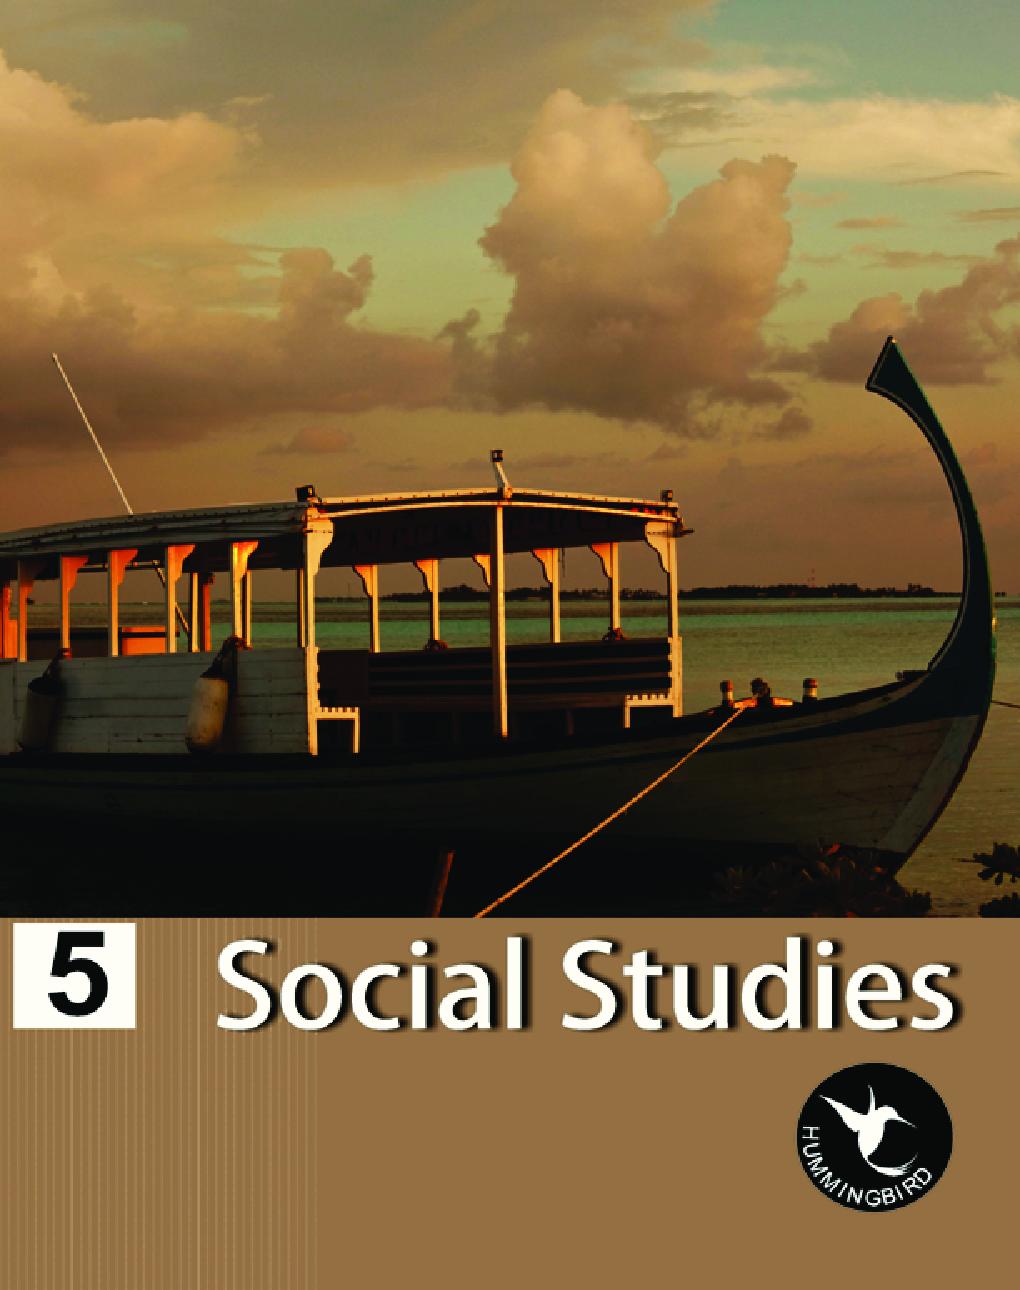 Humming Bird Social Study-5    - Page 1